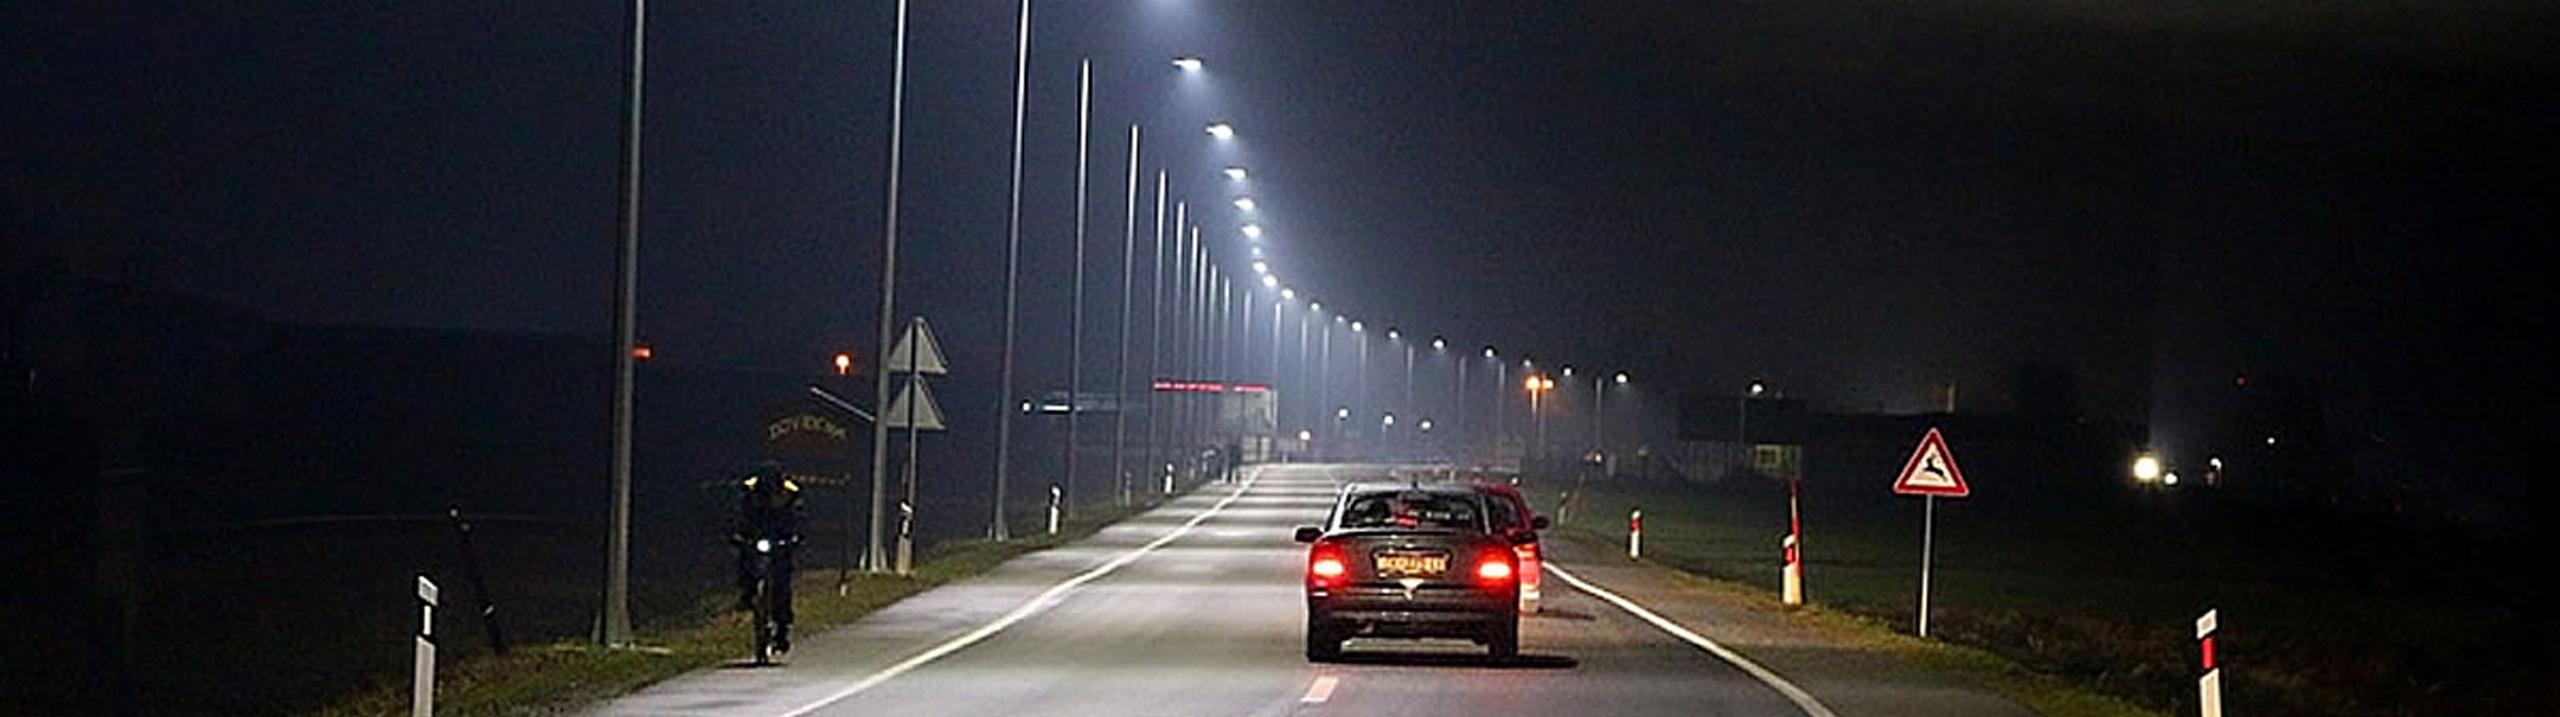 Straßenbeleuchtung protec ENERGYPLUS GmbH